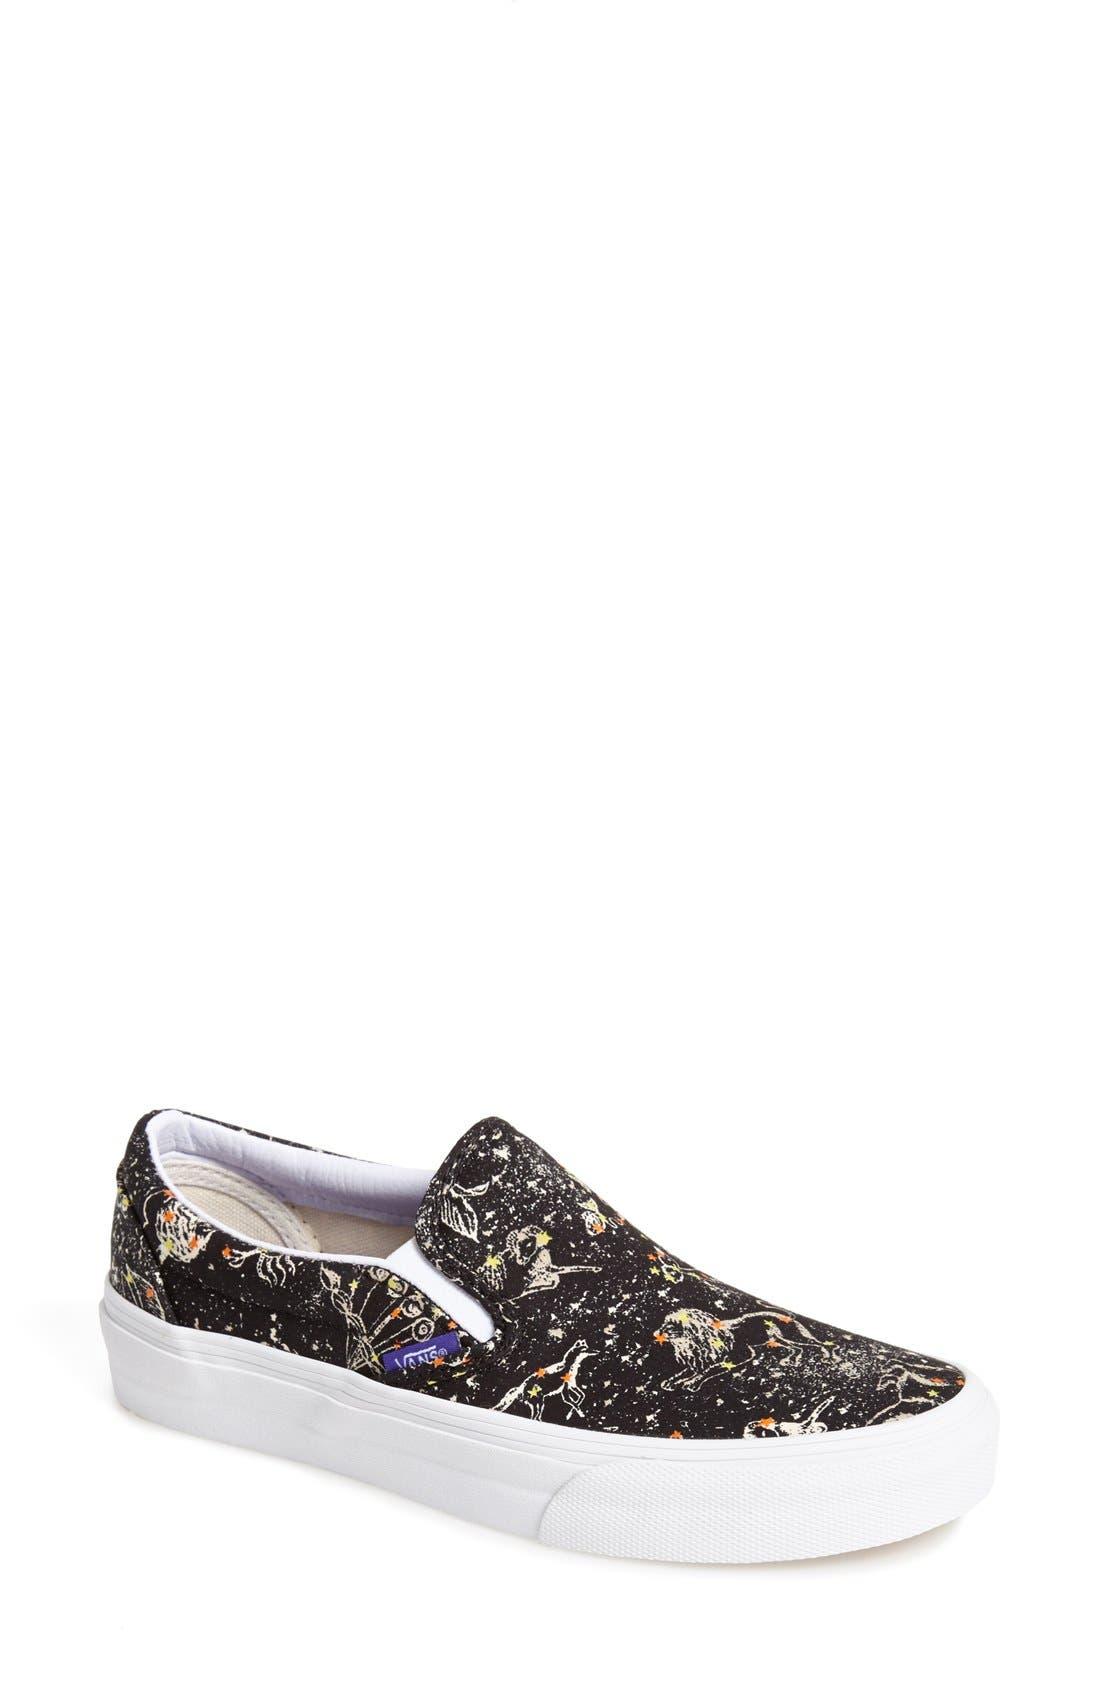 Alternate Image 1 Selected - Liberty x Vans 'Classic' Slip-On Sneaker (Women)